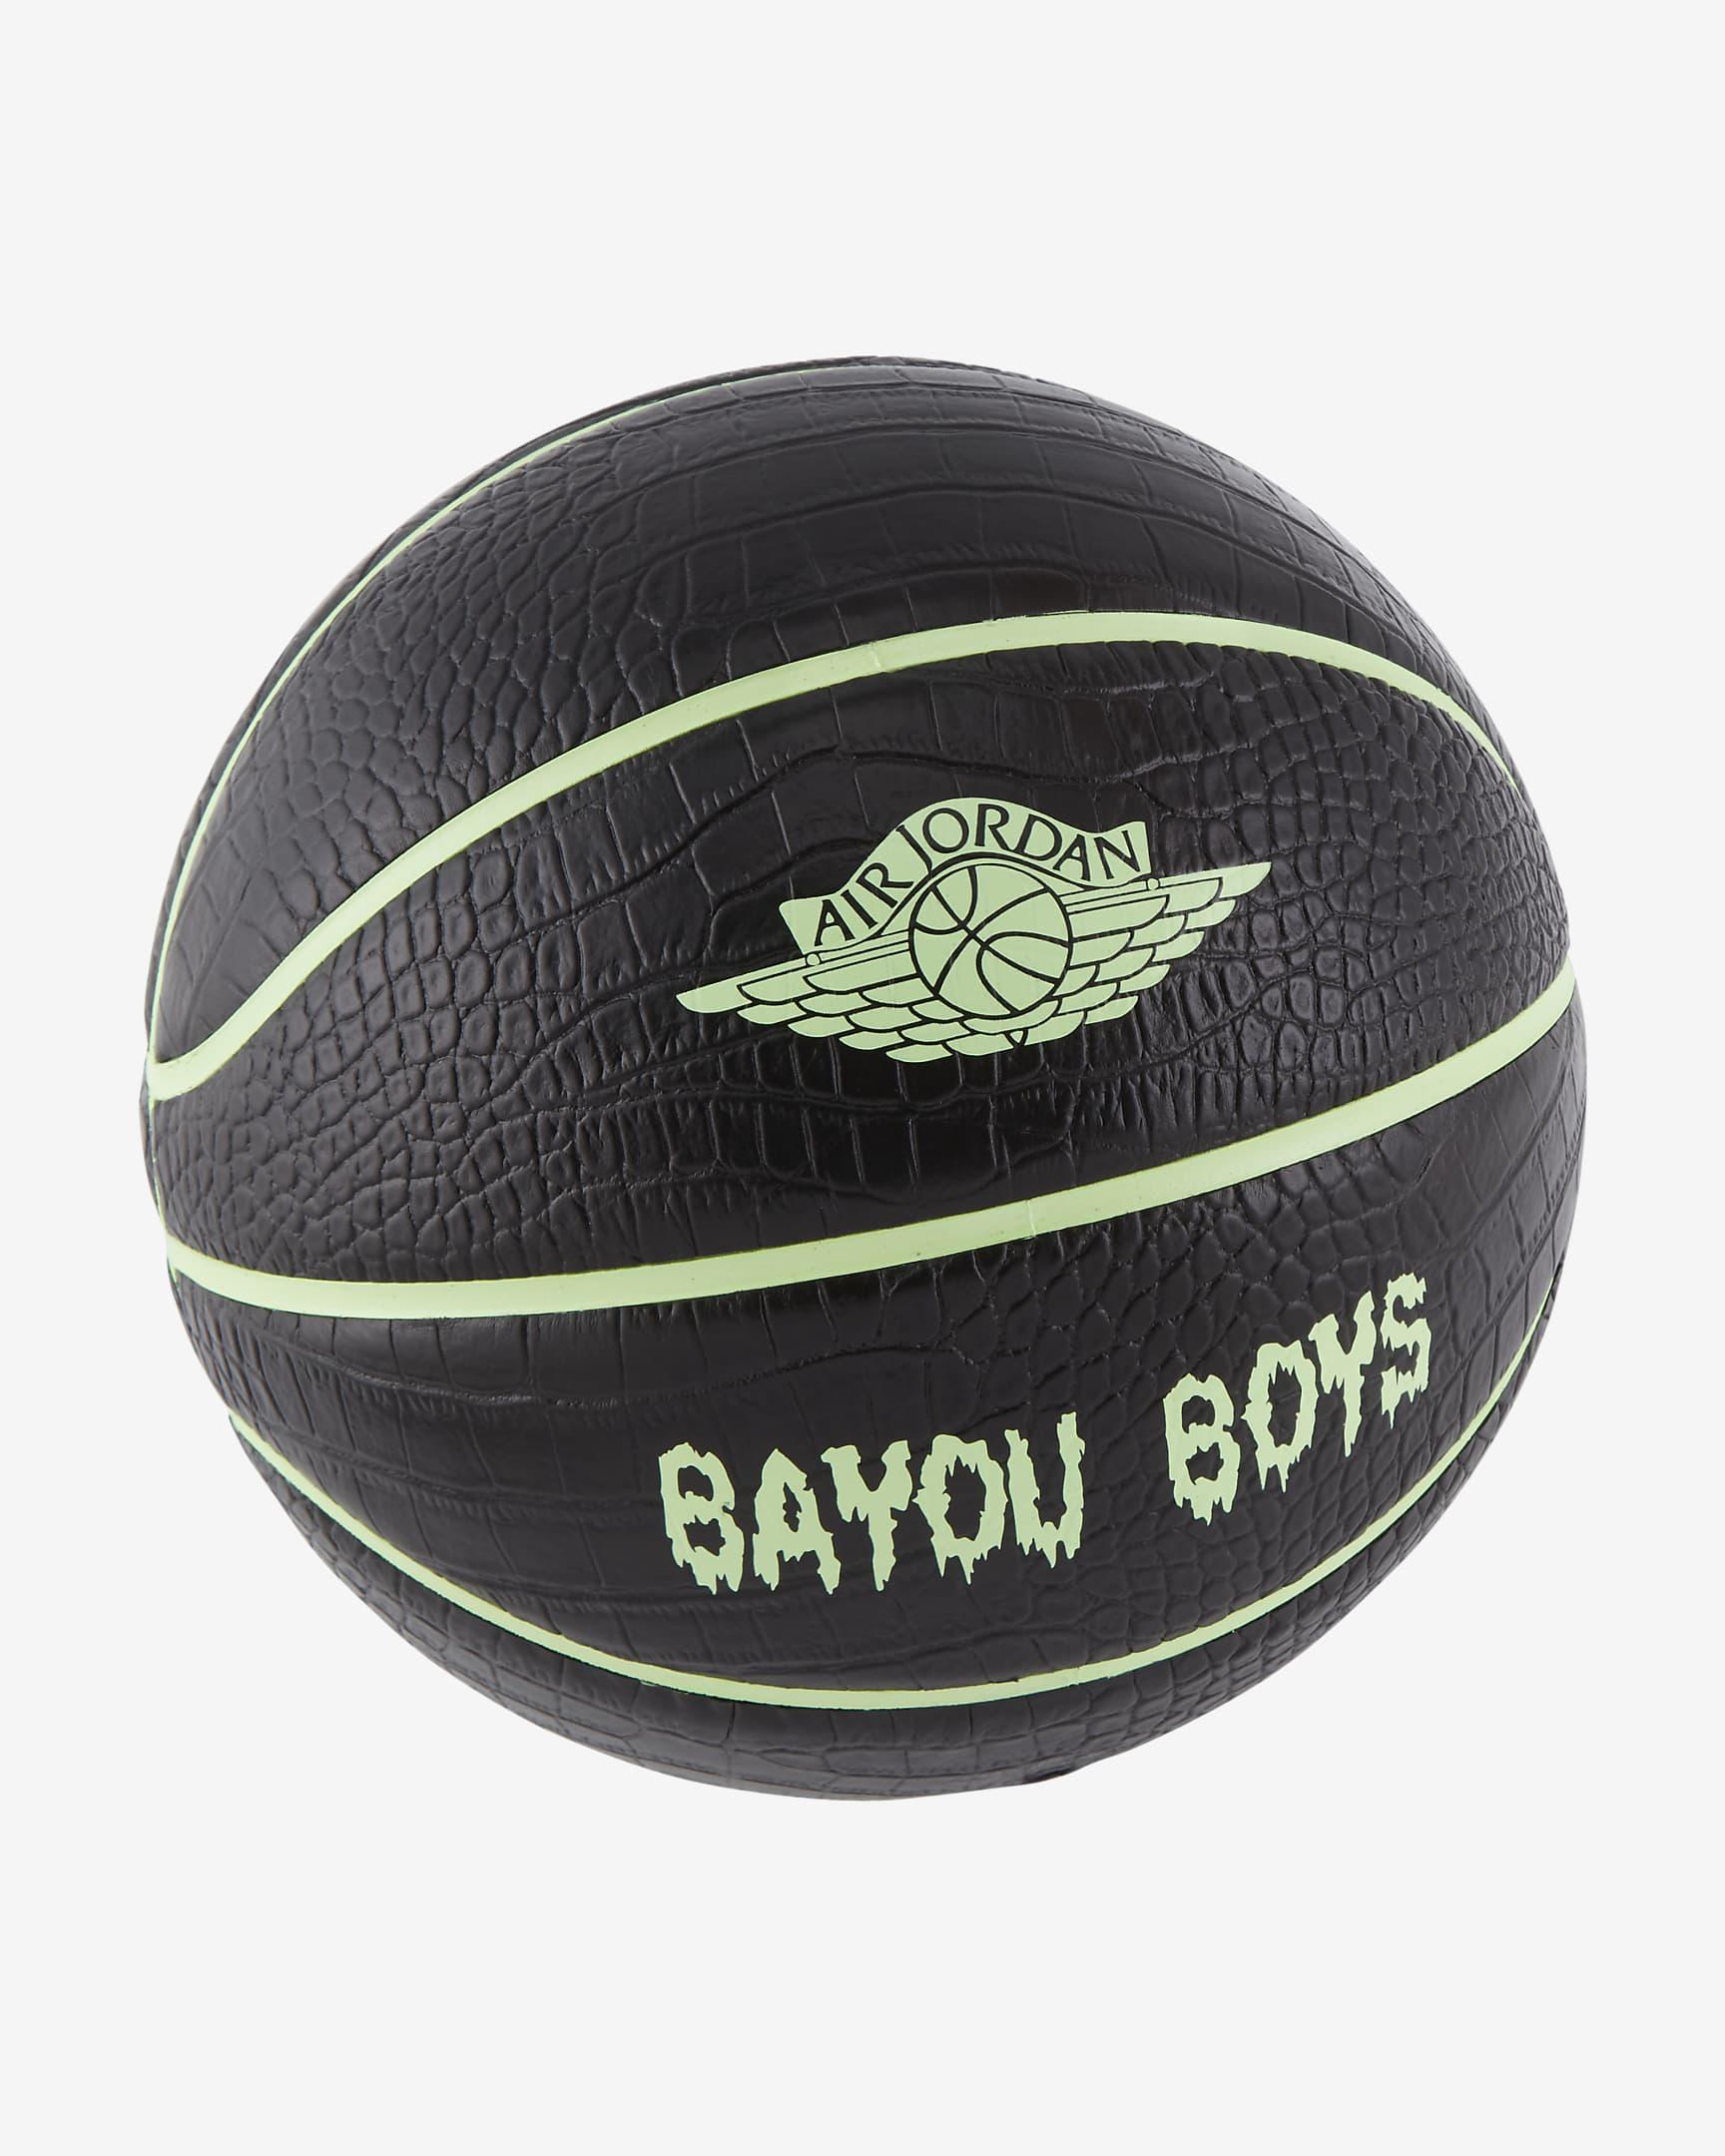 Jordan X Bayou Boys Basketball, Size: 7